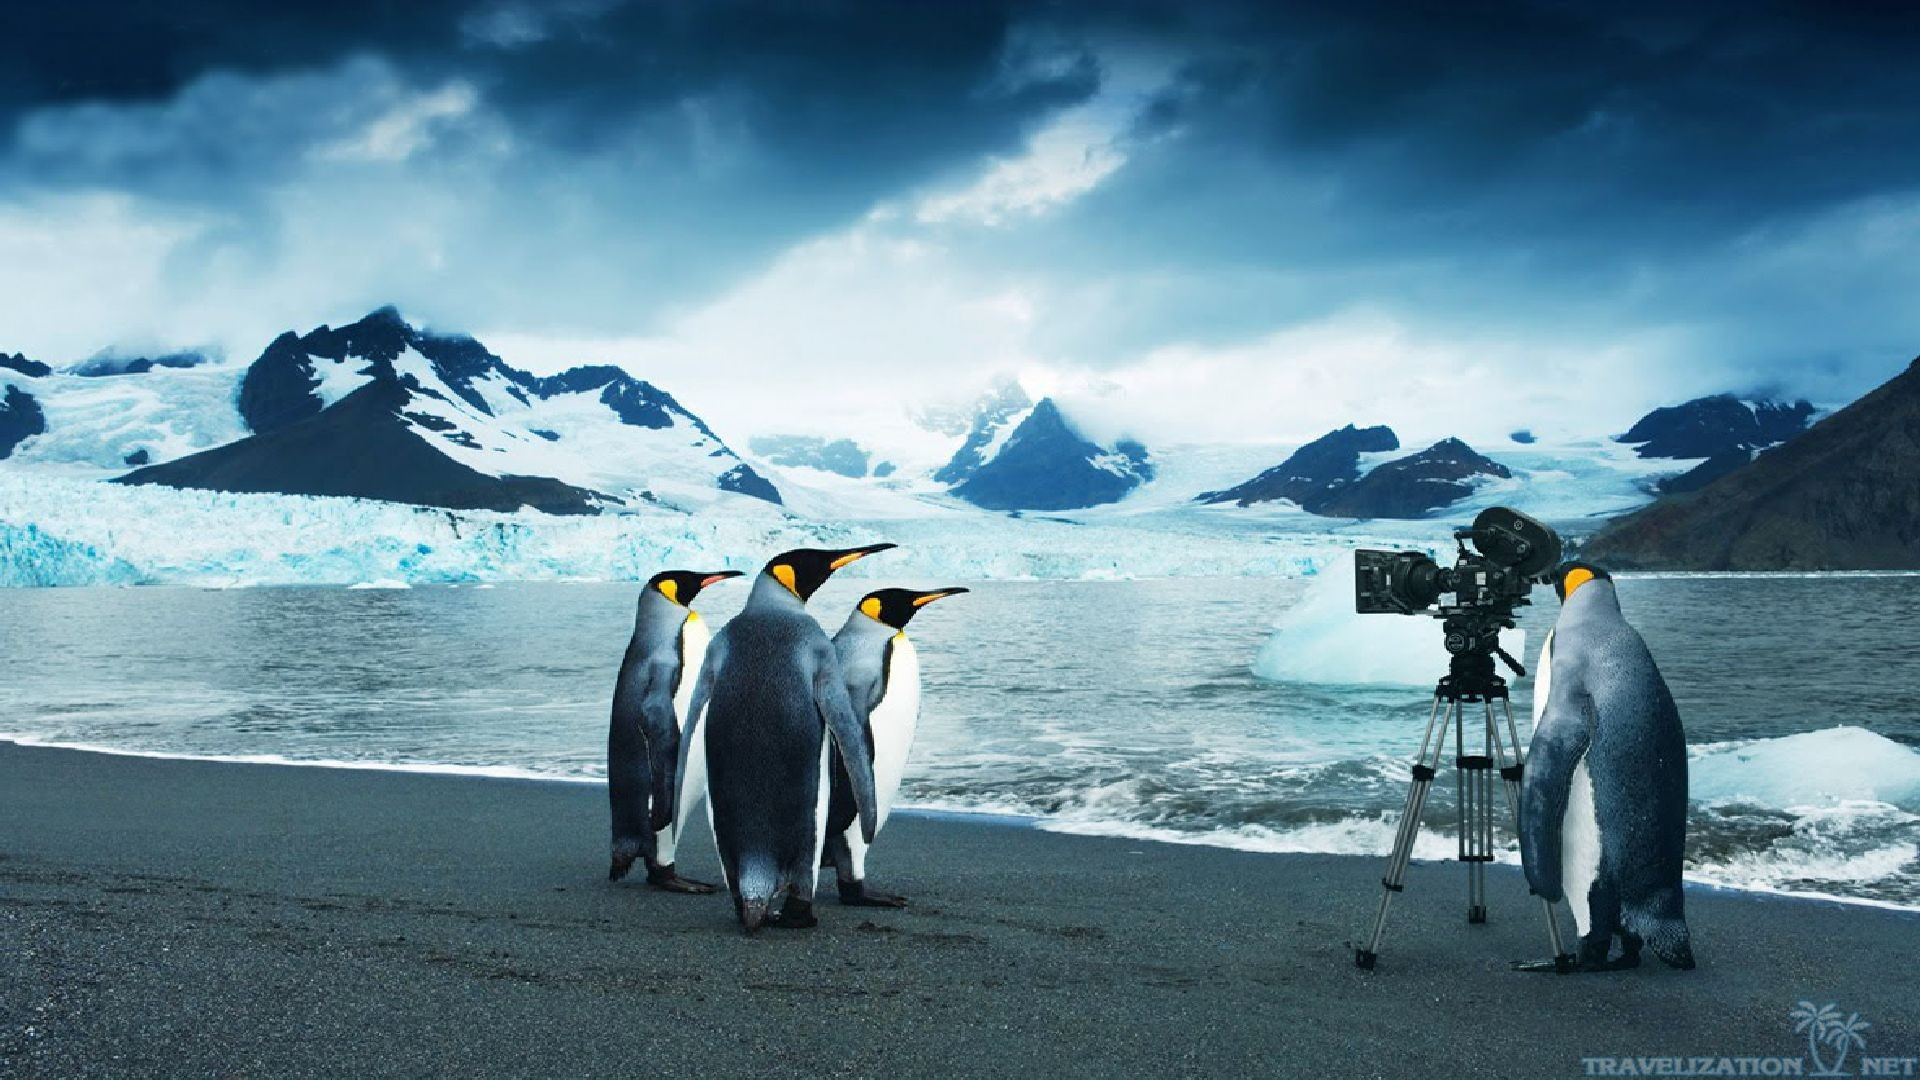 Pittsburgh Penguins HD desktop wallpaper : Widescreen : High Images Of Penguins  Wallpapers Wallpapers)